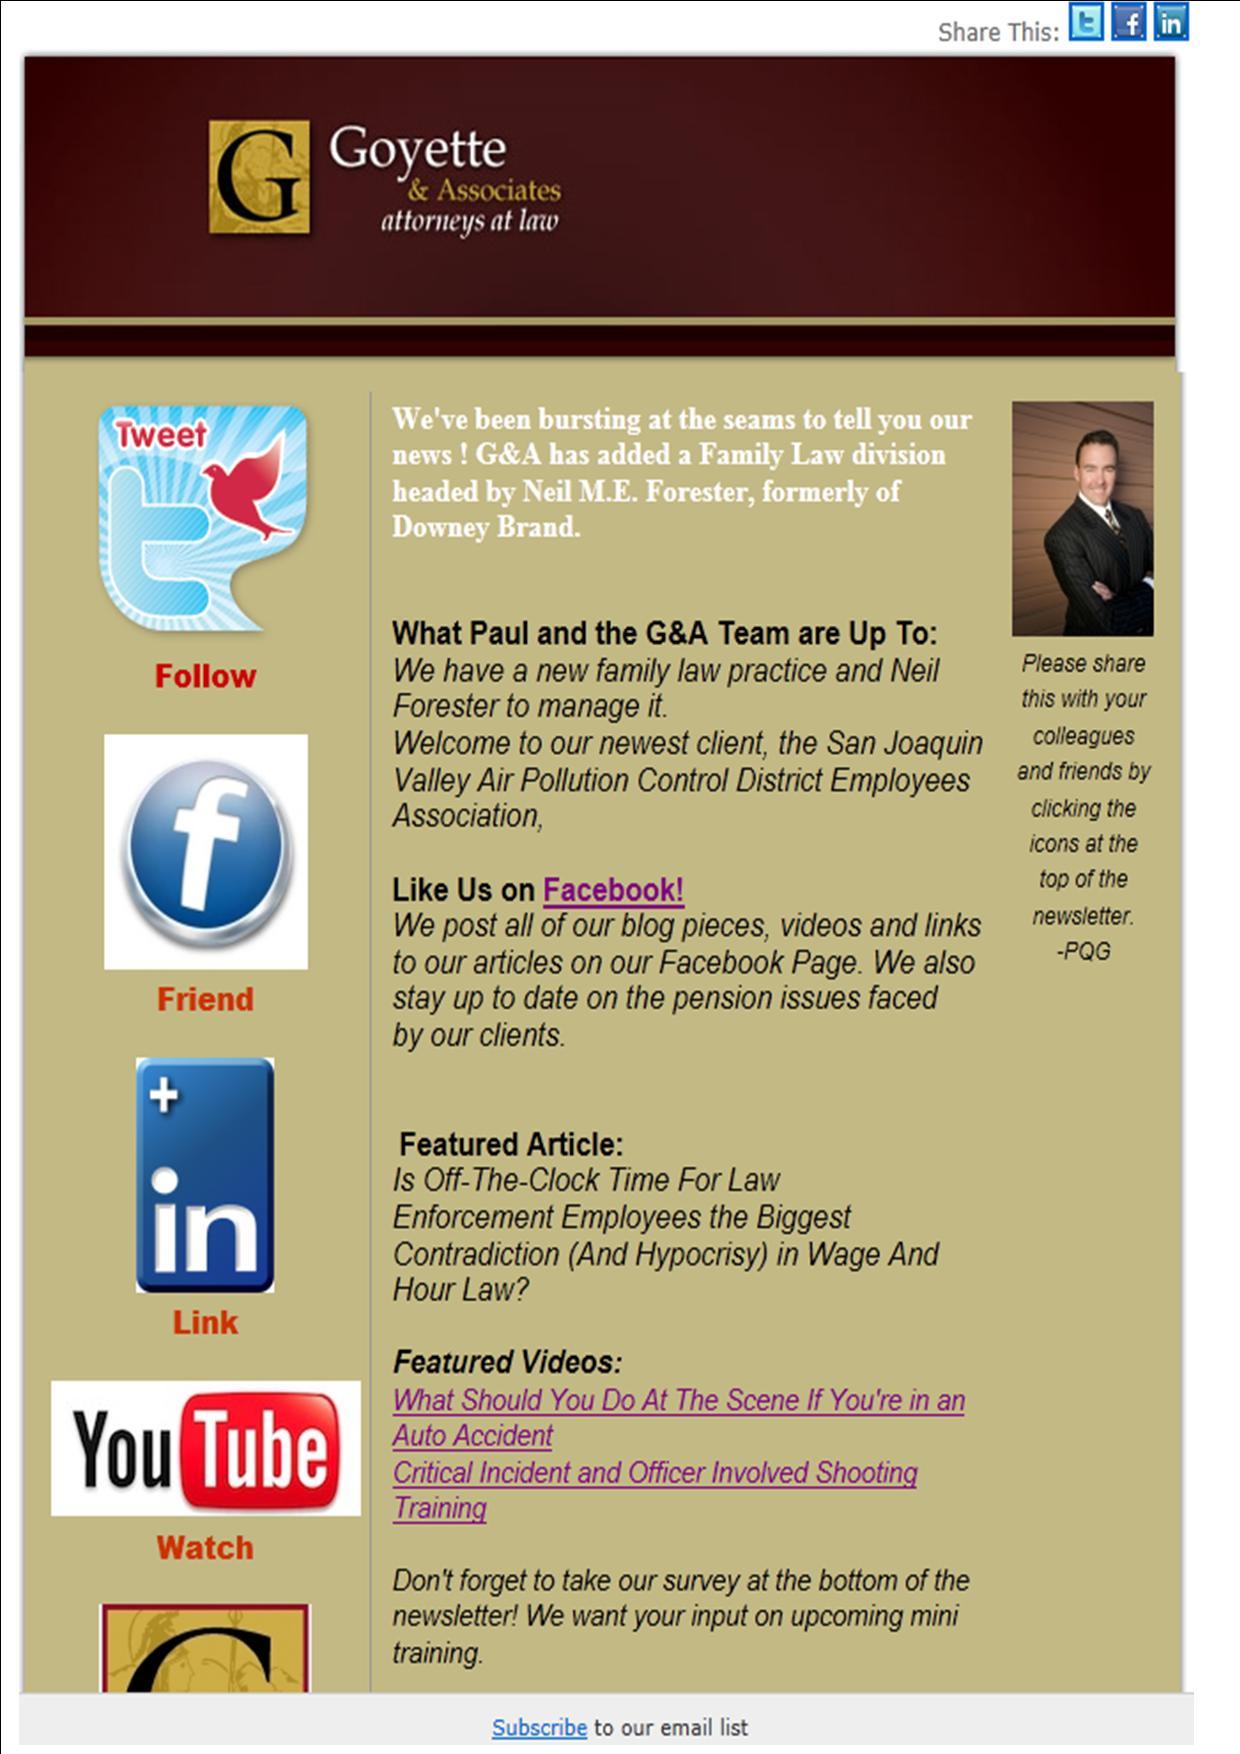 Goyette's May Newsletter Anouncing Family Law